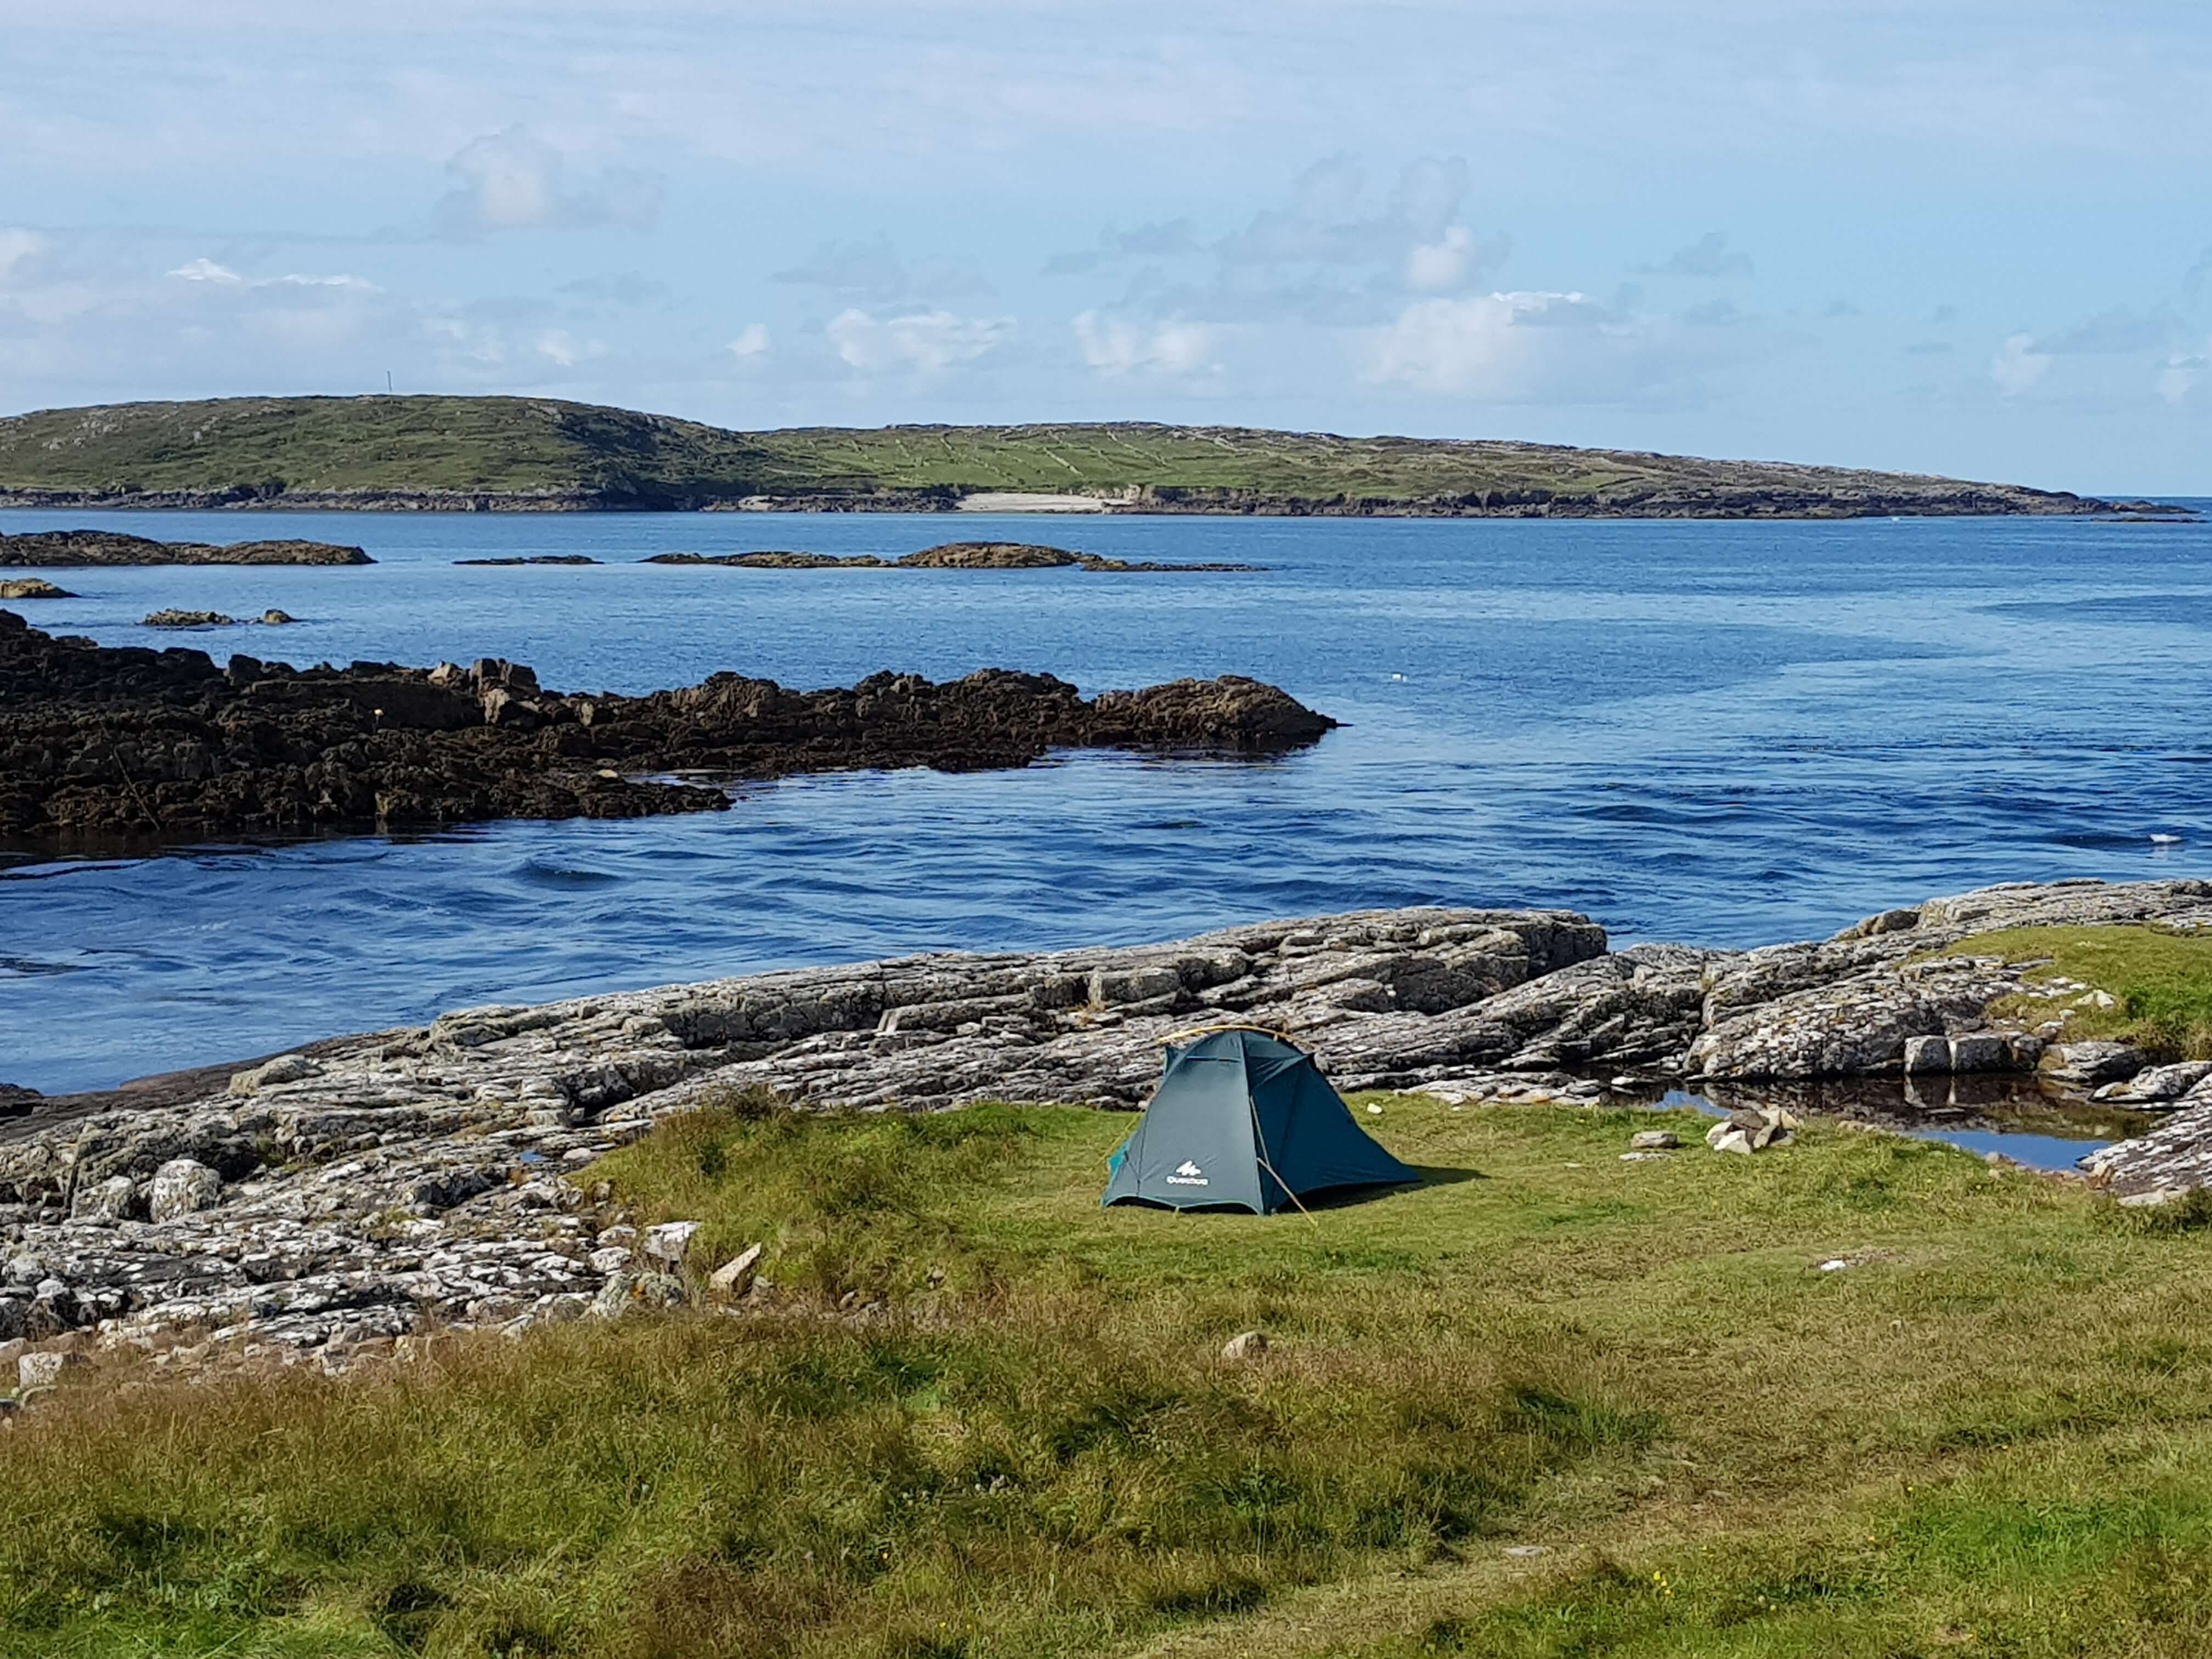 Camping on the Wild Atlantic Way